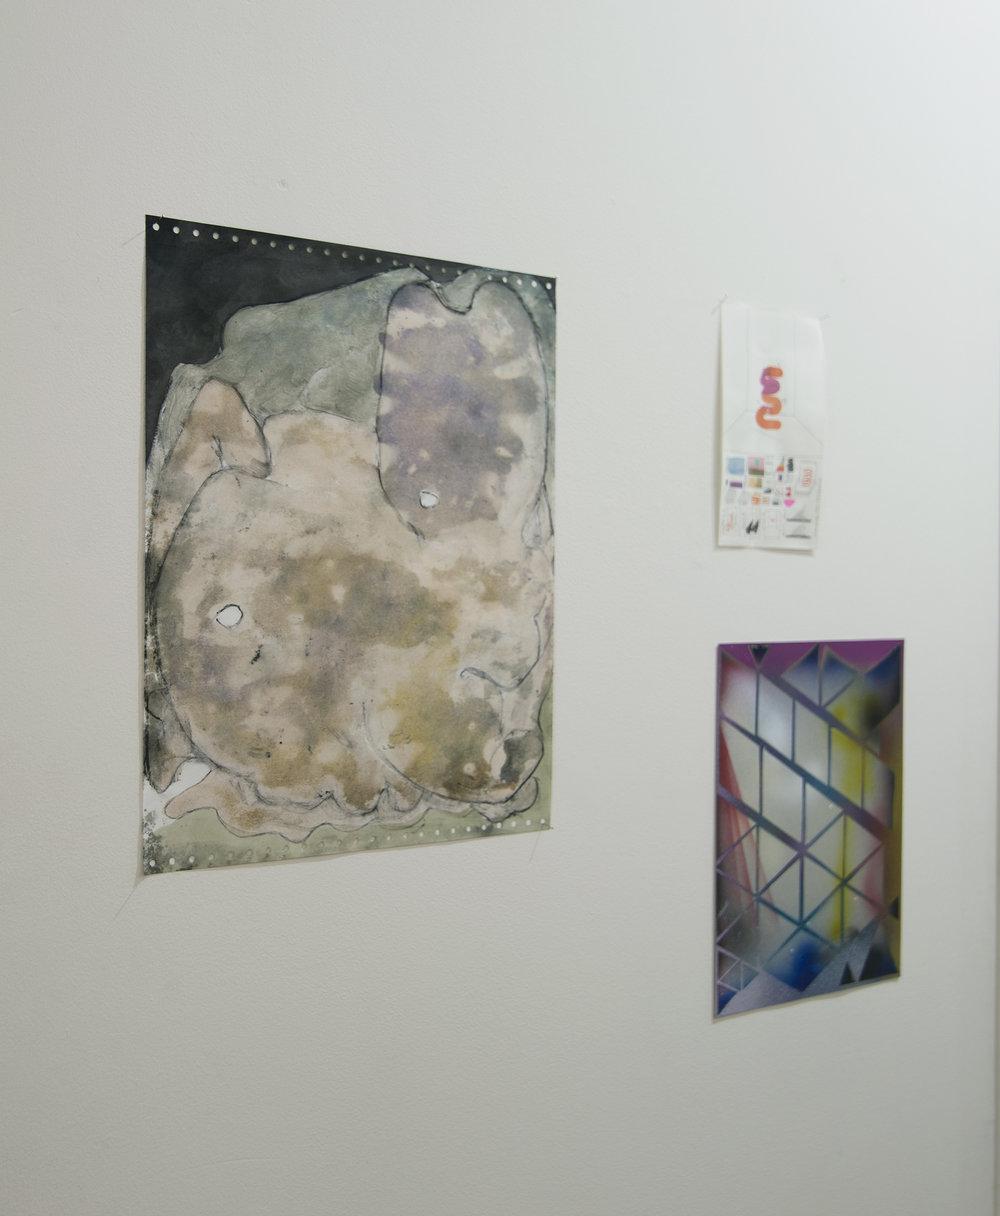 Dominik Steiner / Yuri Masnyj (top) / Jay Davis (bottom)